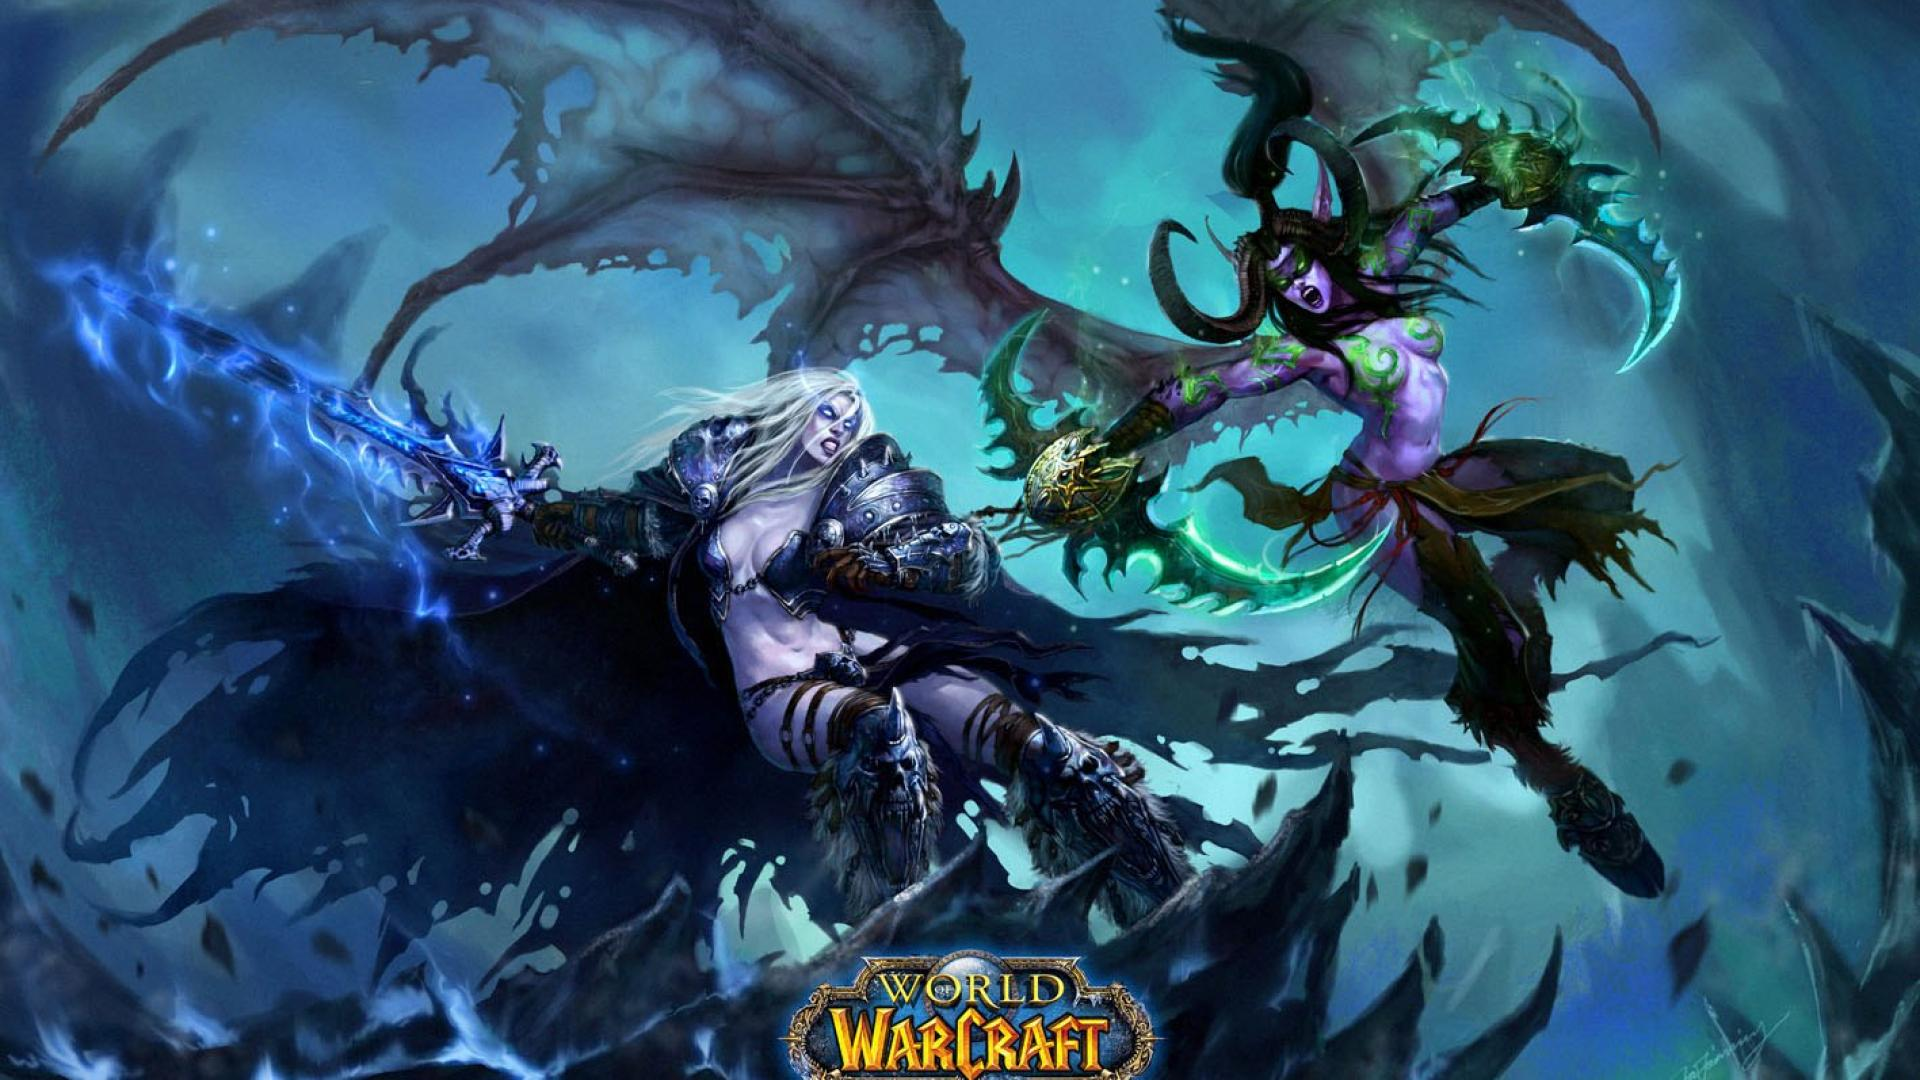 World Of Warcraft Wallpaper Desktop Background ~ Sdeerwallpaper